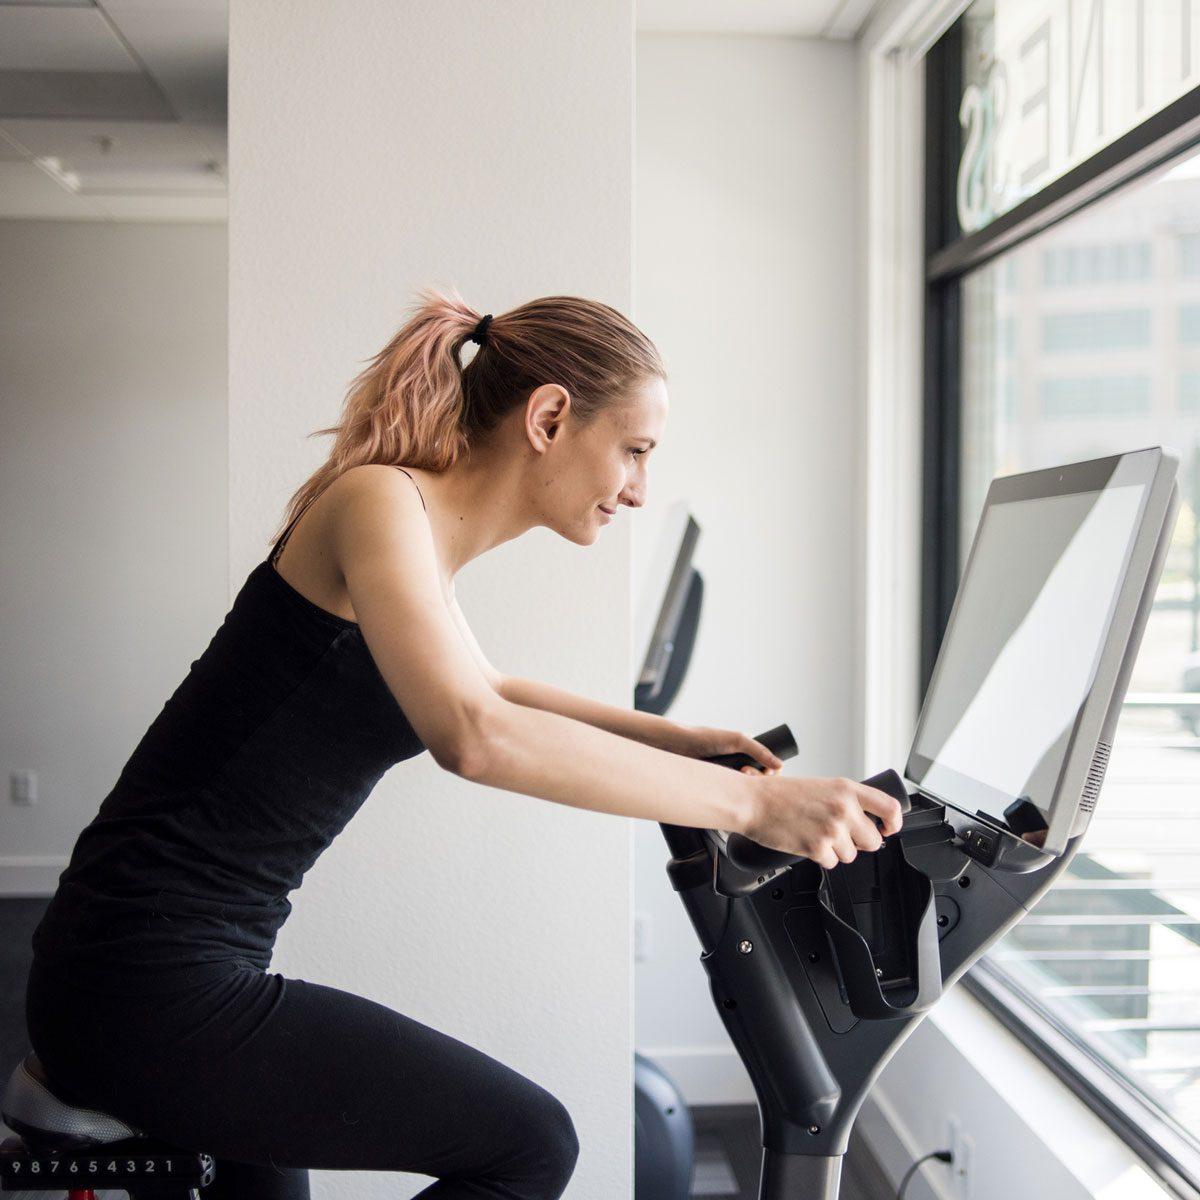 Woman using a stationary bike